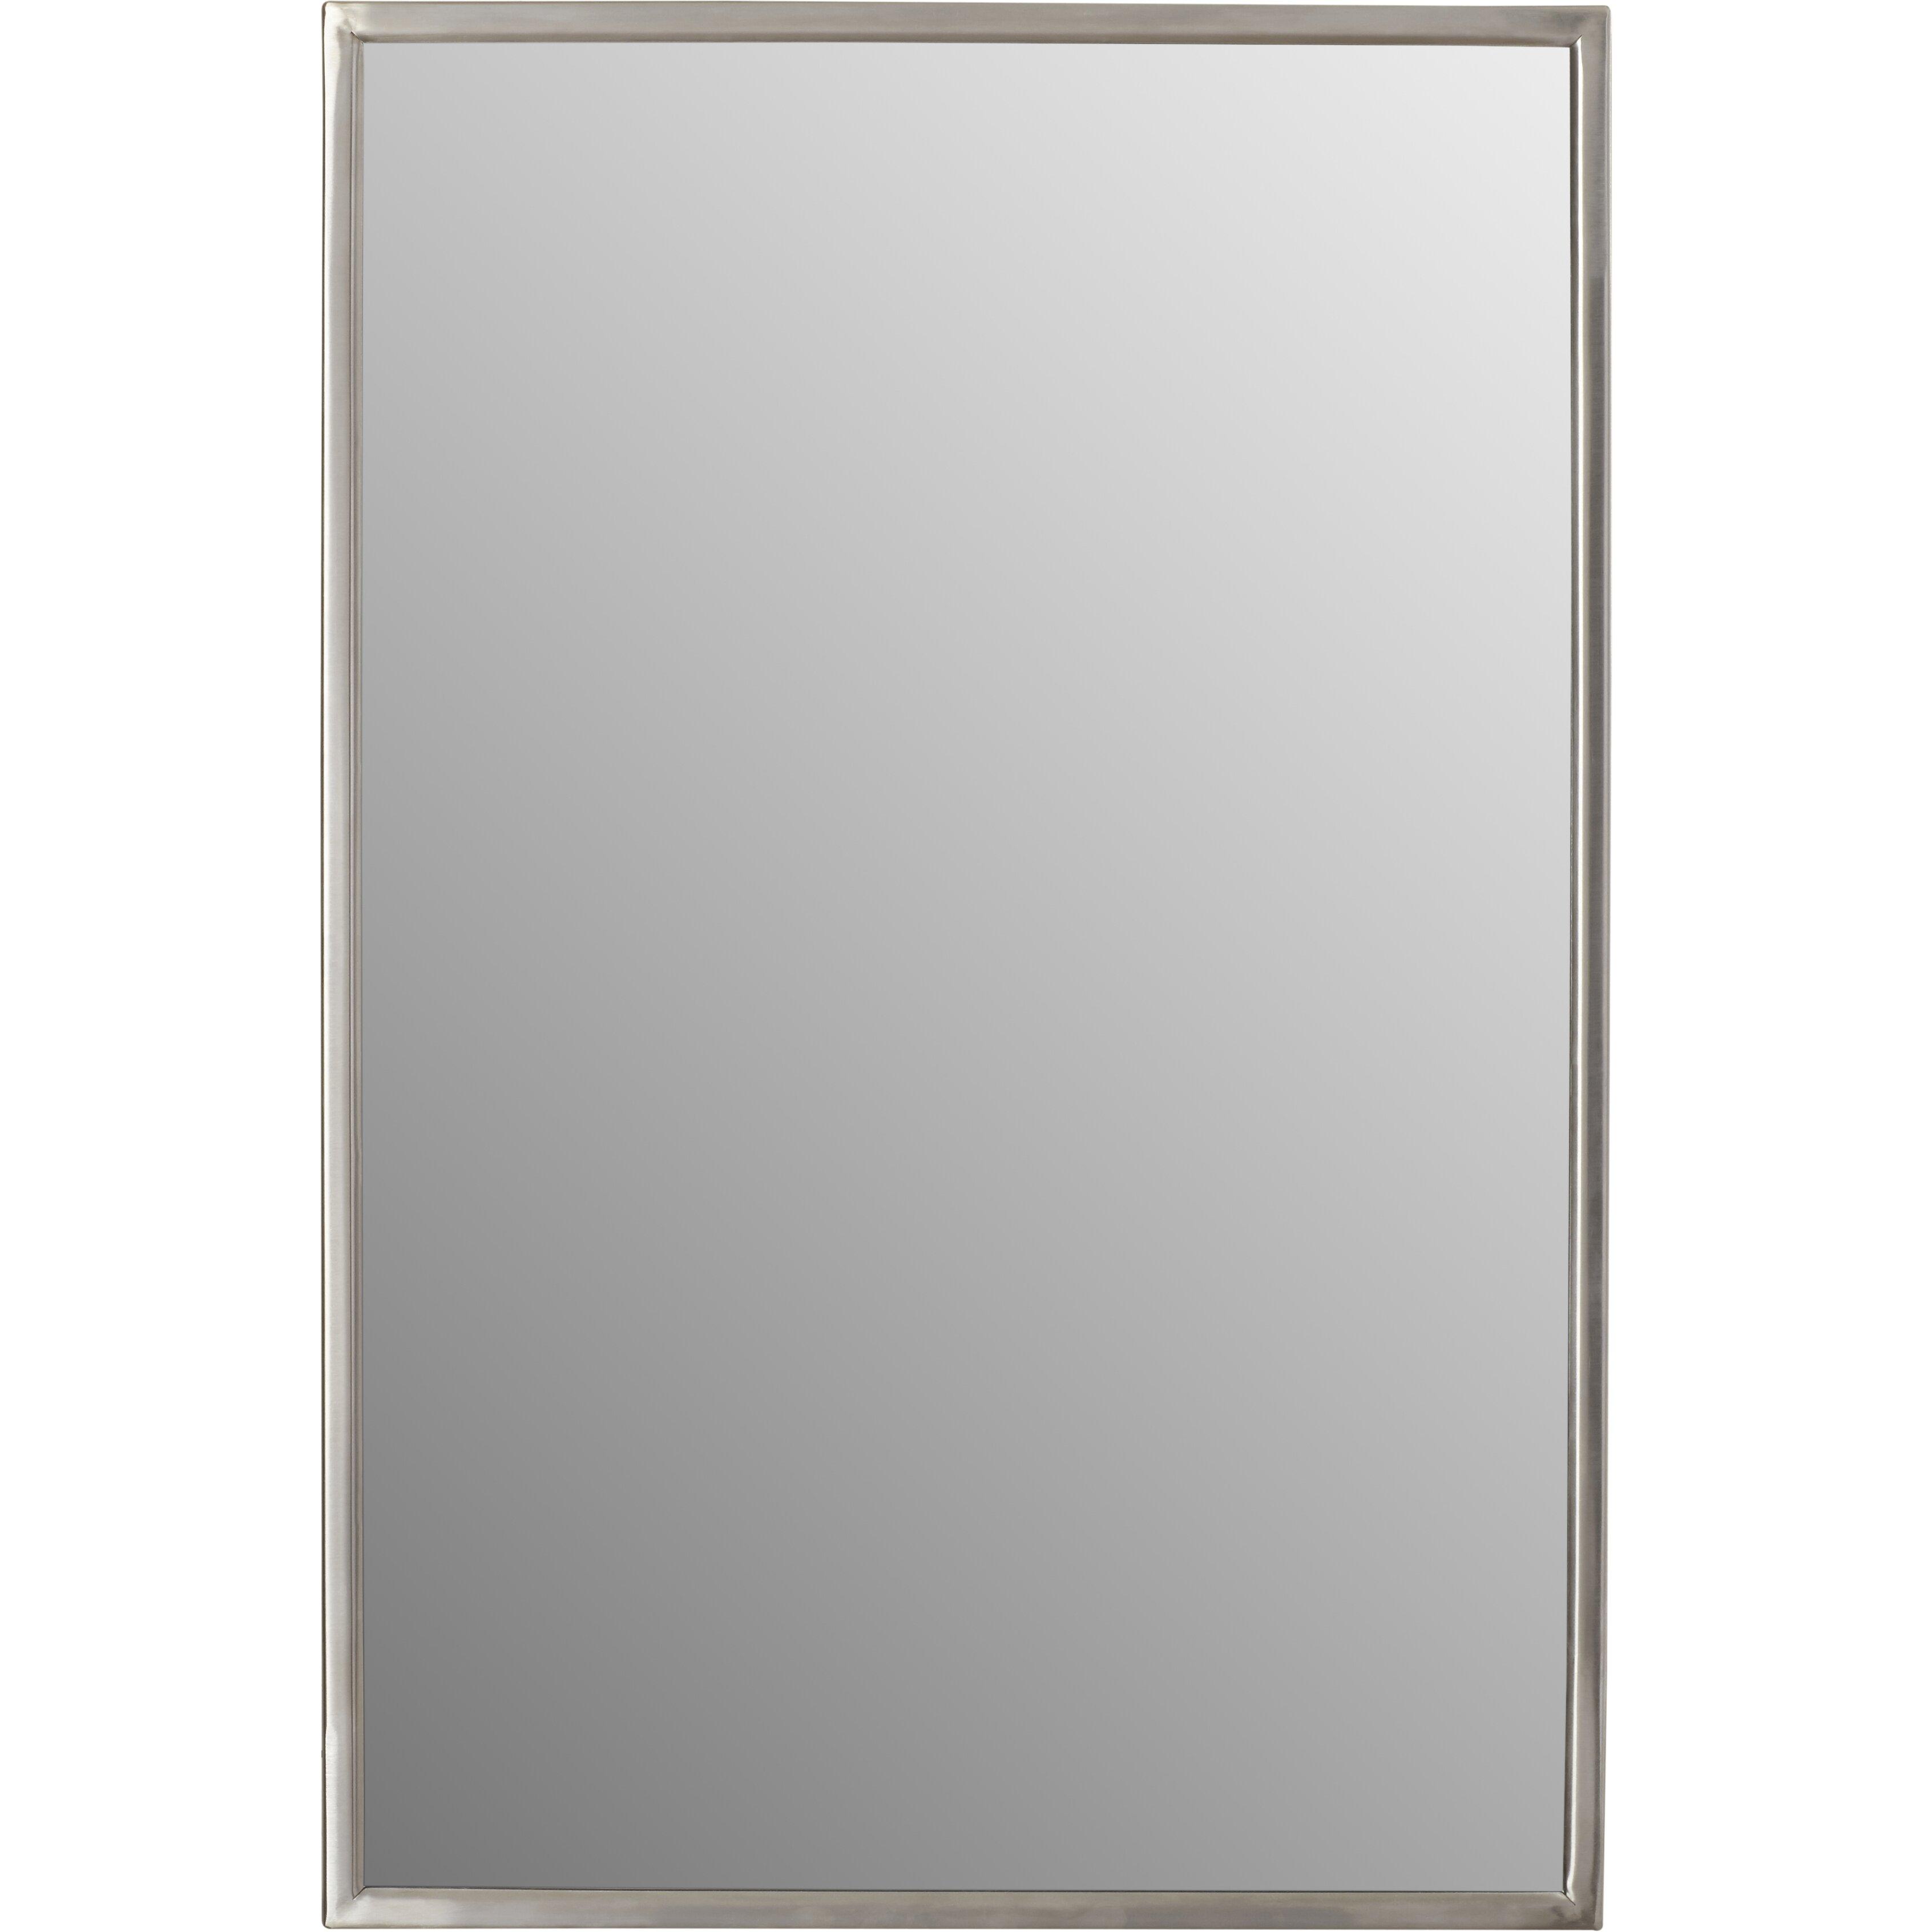 Varick Gallery Ewell Angle Frame Wall Mirror Amp Reviews